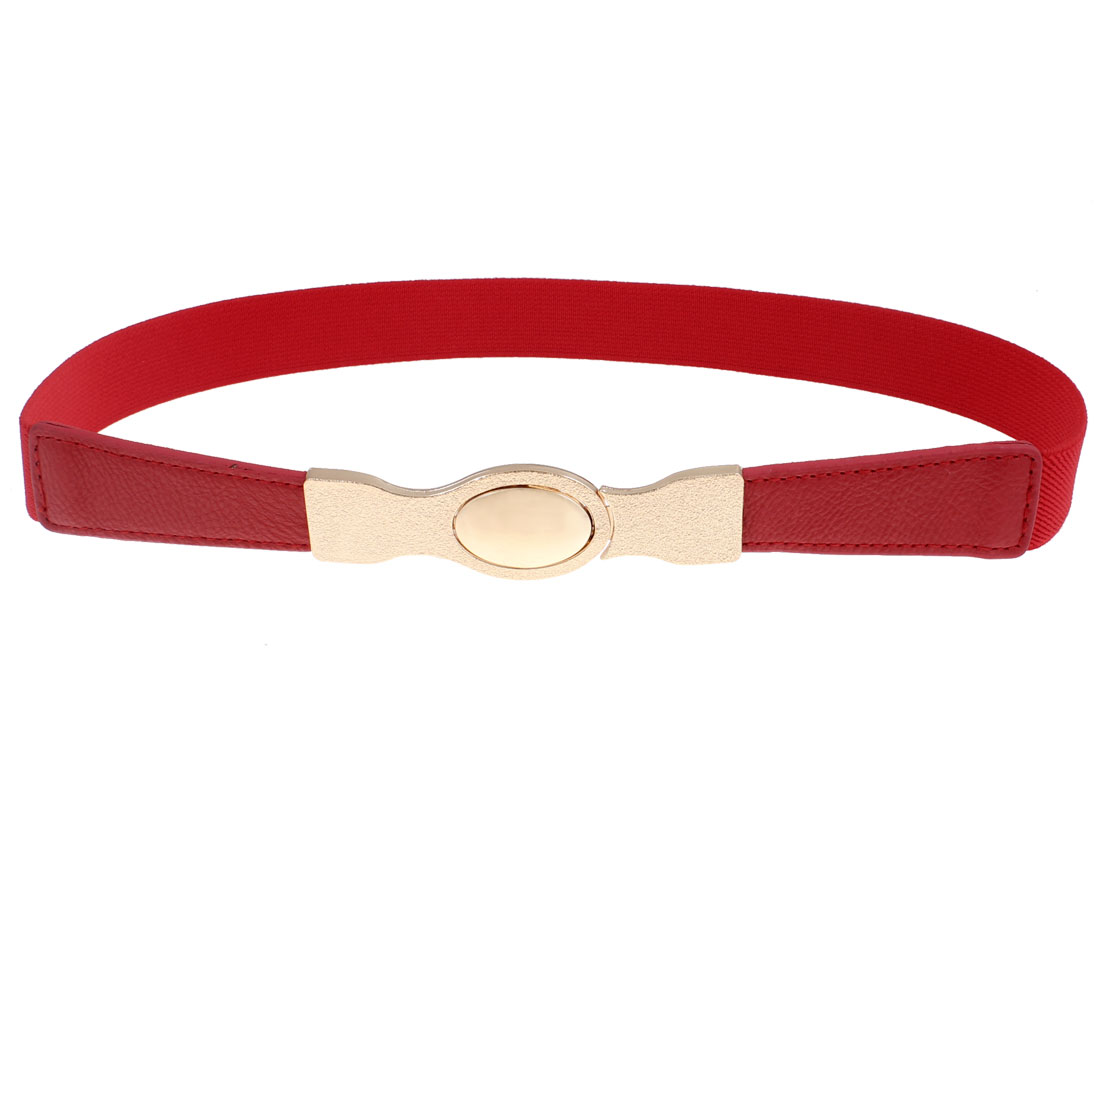 Women Oval Interlock Buckle Elastic Red Waistband Cinch Belt